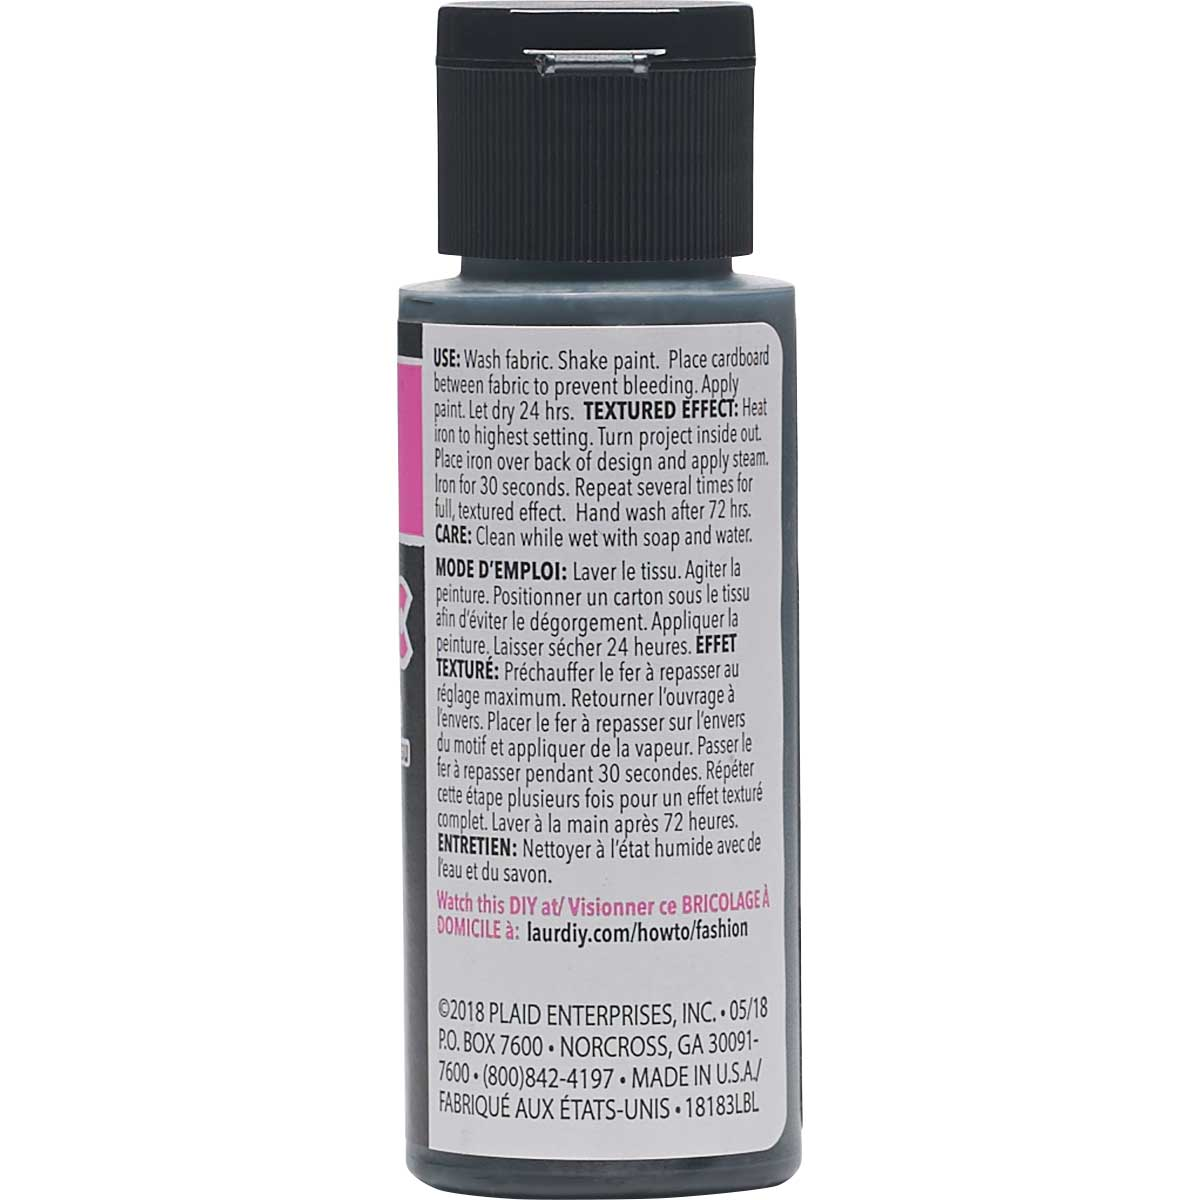 LaurDIY ® Texturific™ Fabric Paint - False Alarm, 2 oz.